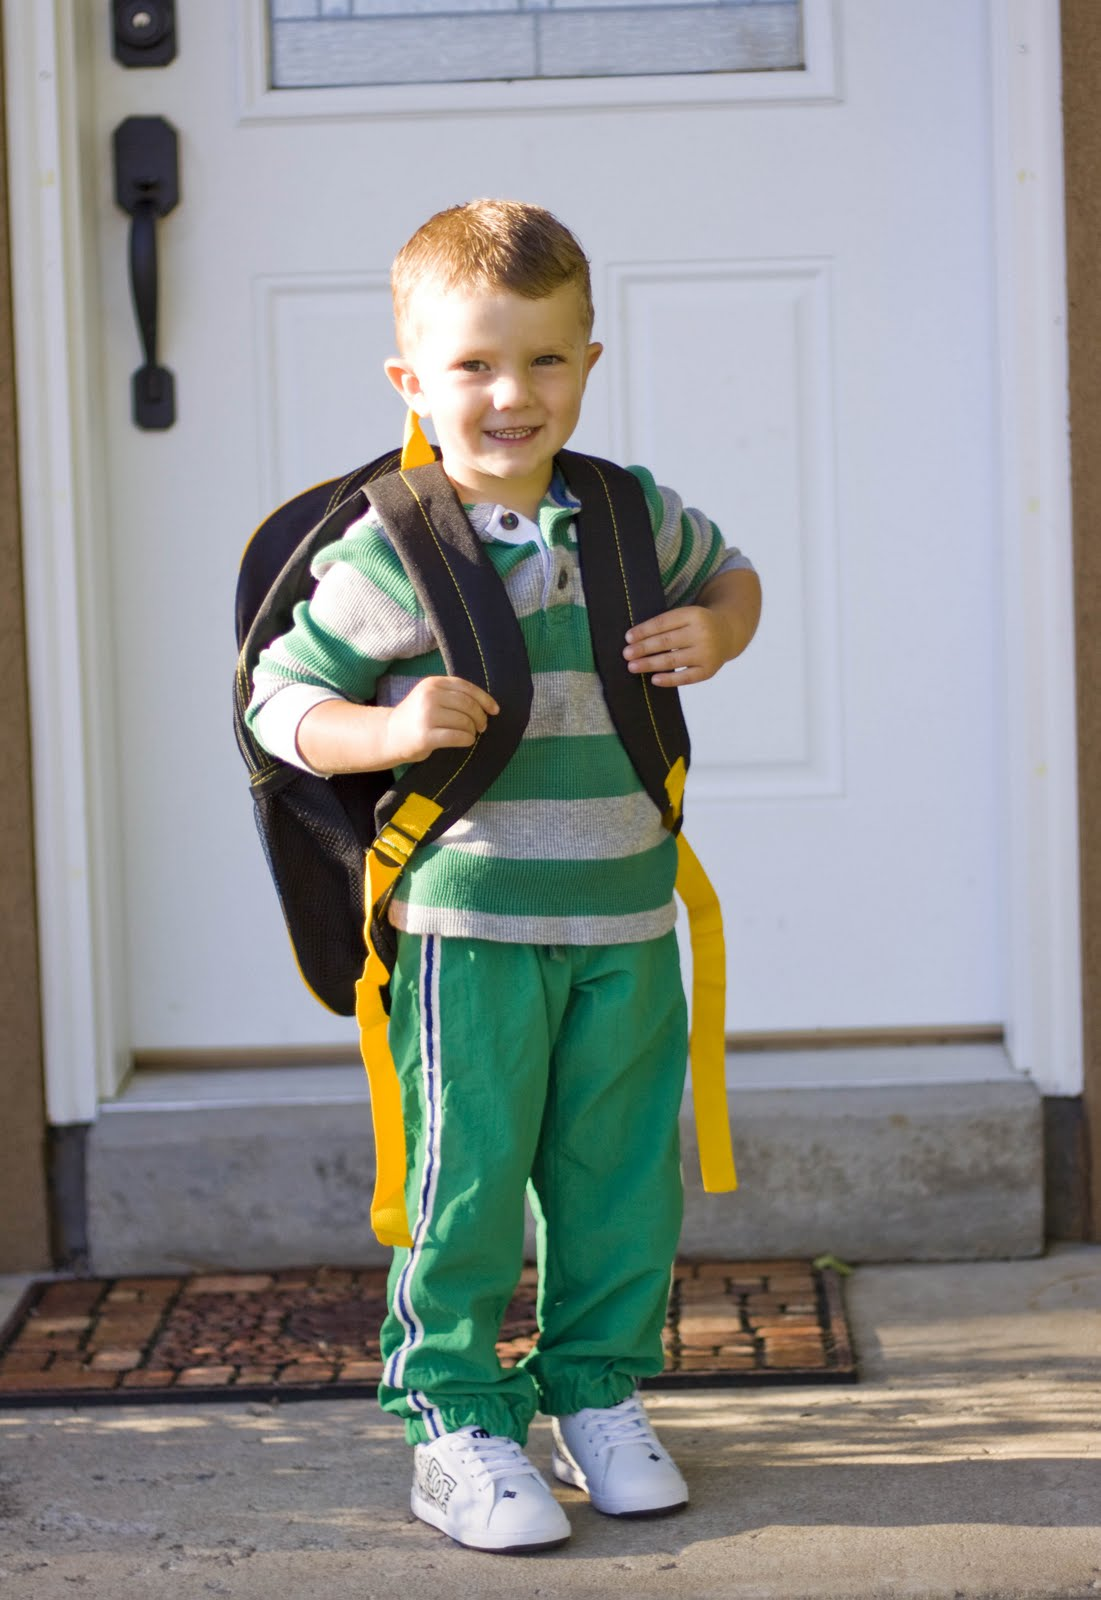 parker preschool sagers family s day of preschool 451